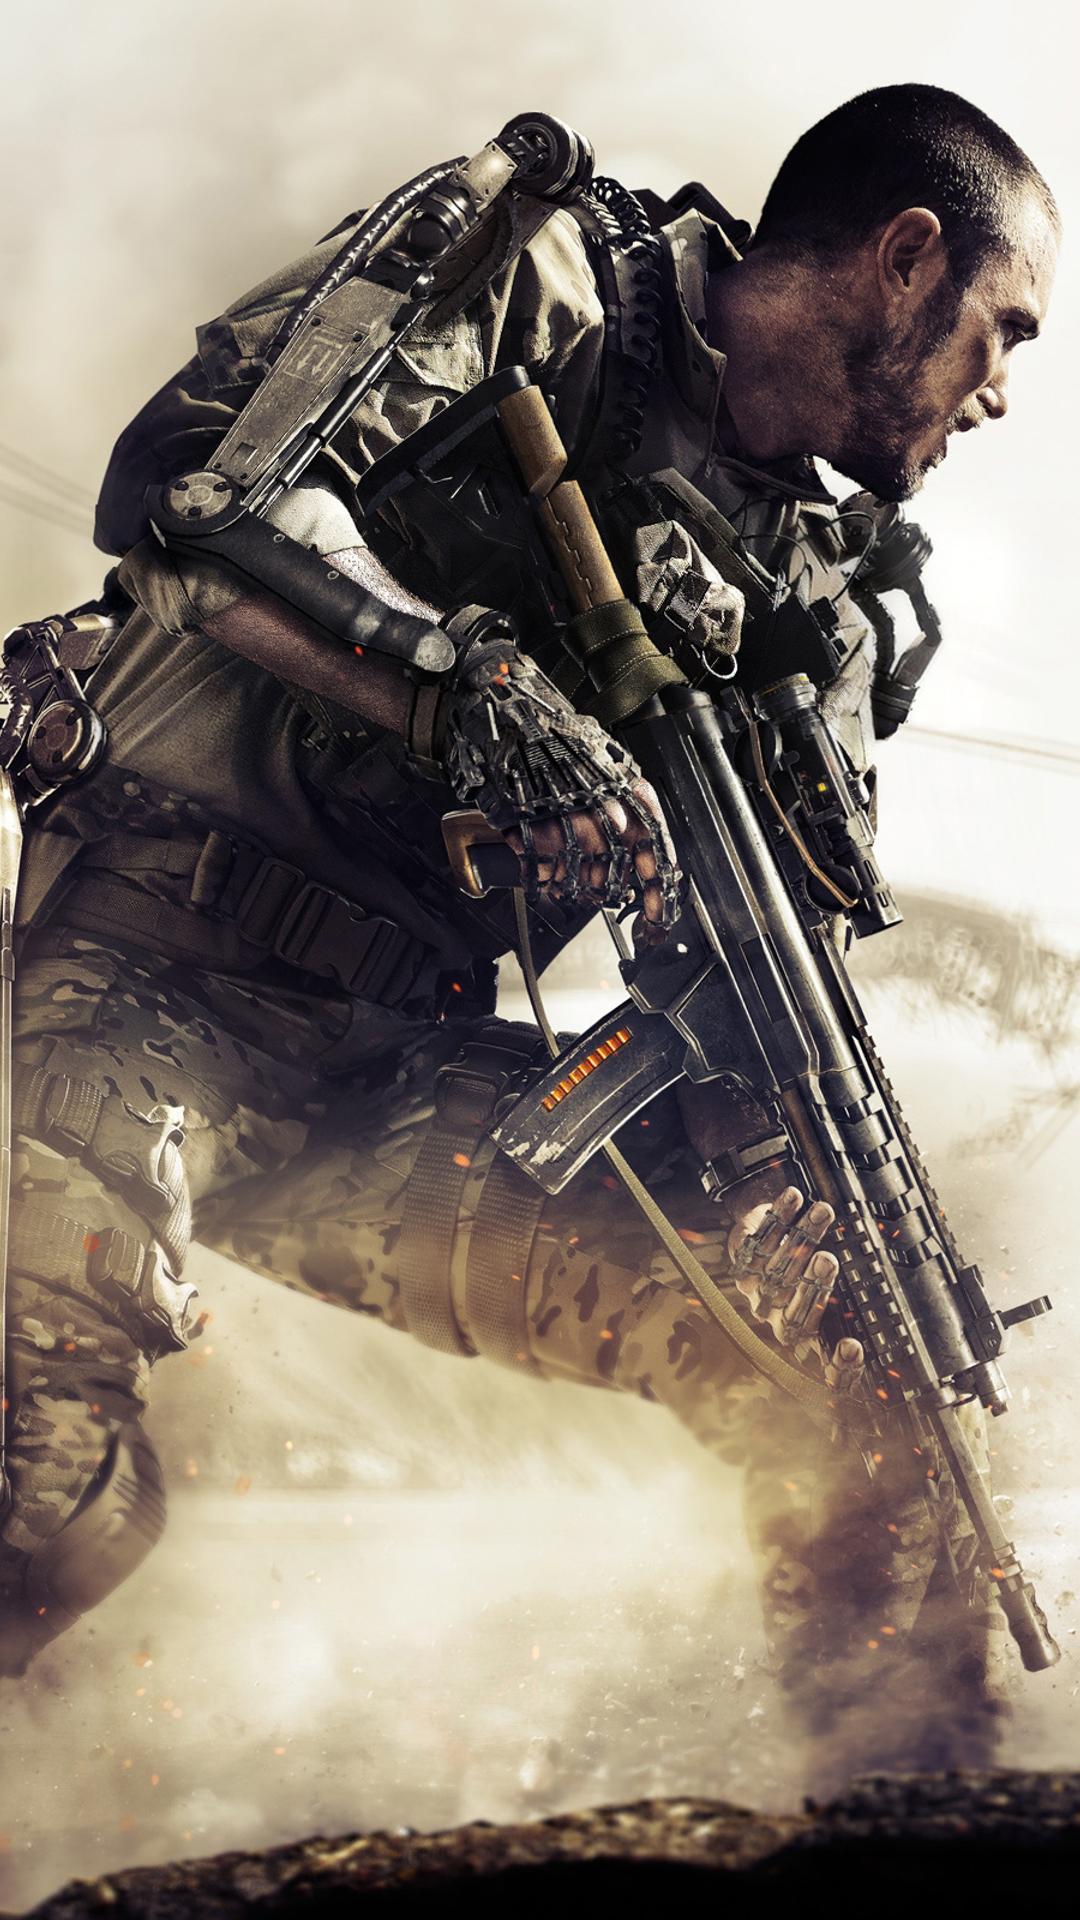 call of duty advanced warfare battlefield wallpaper